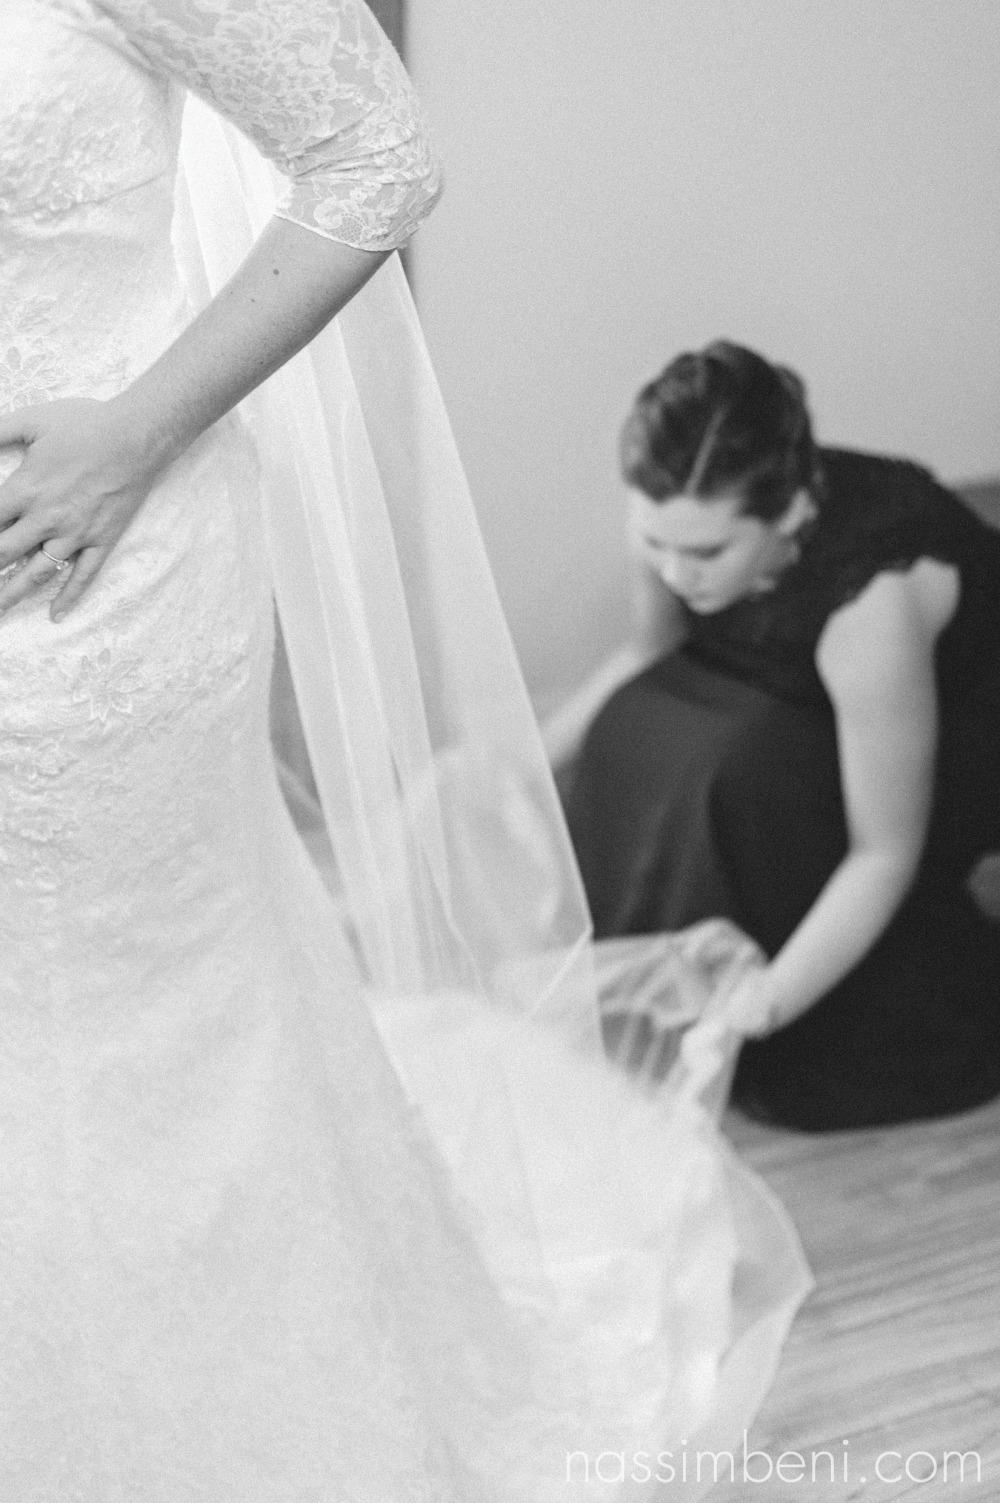 treasure-coast-wedding-photographer-in-port-st-lucie-wedding-nassimbeni-photography-13